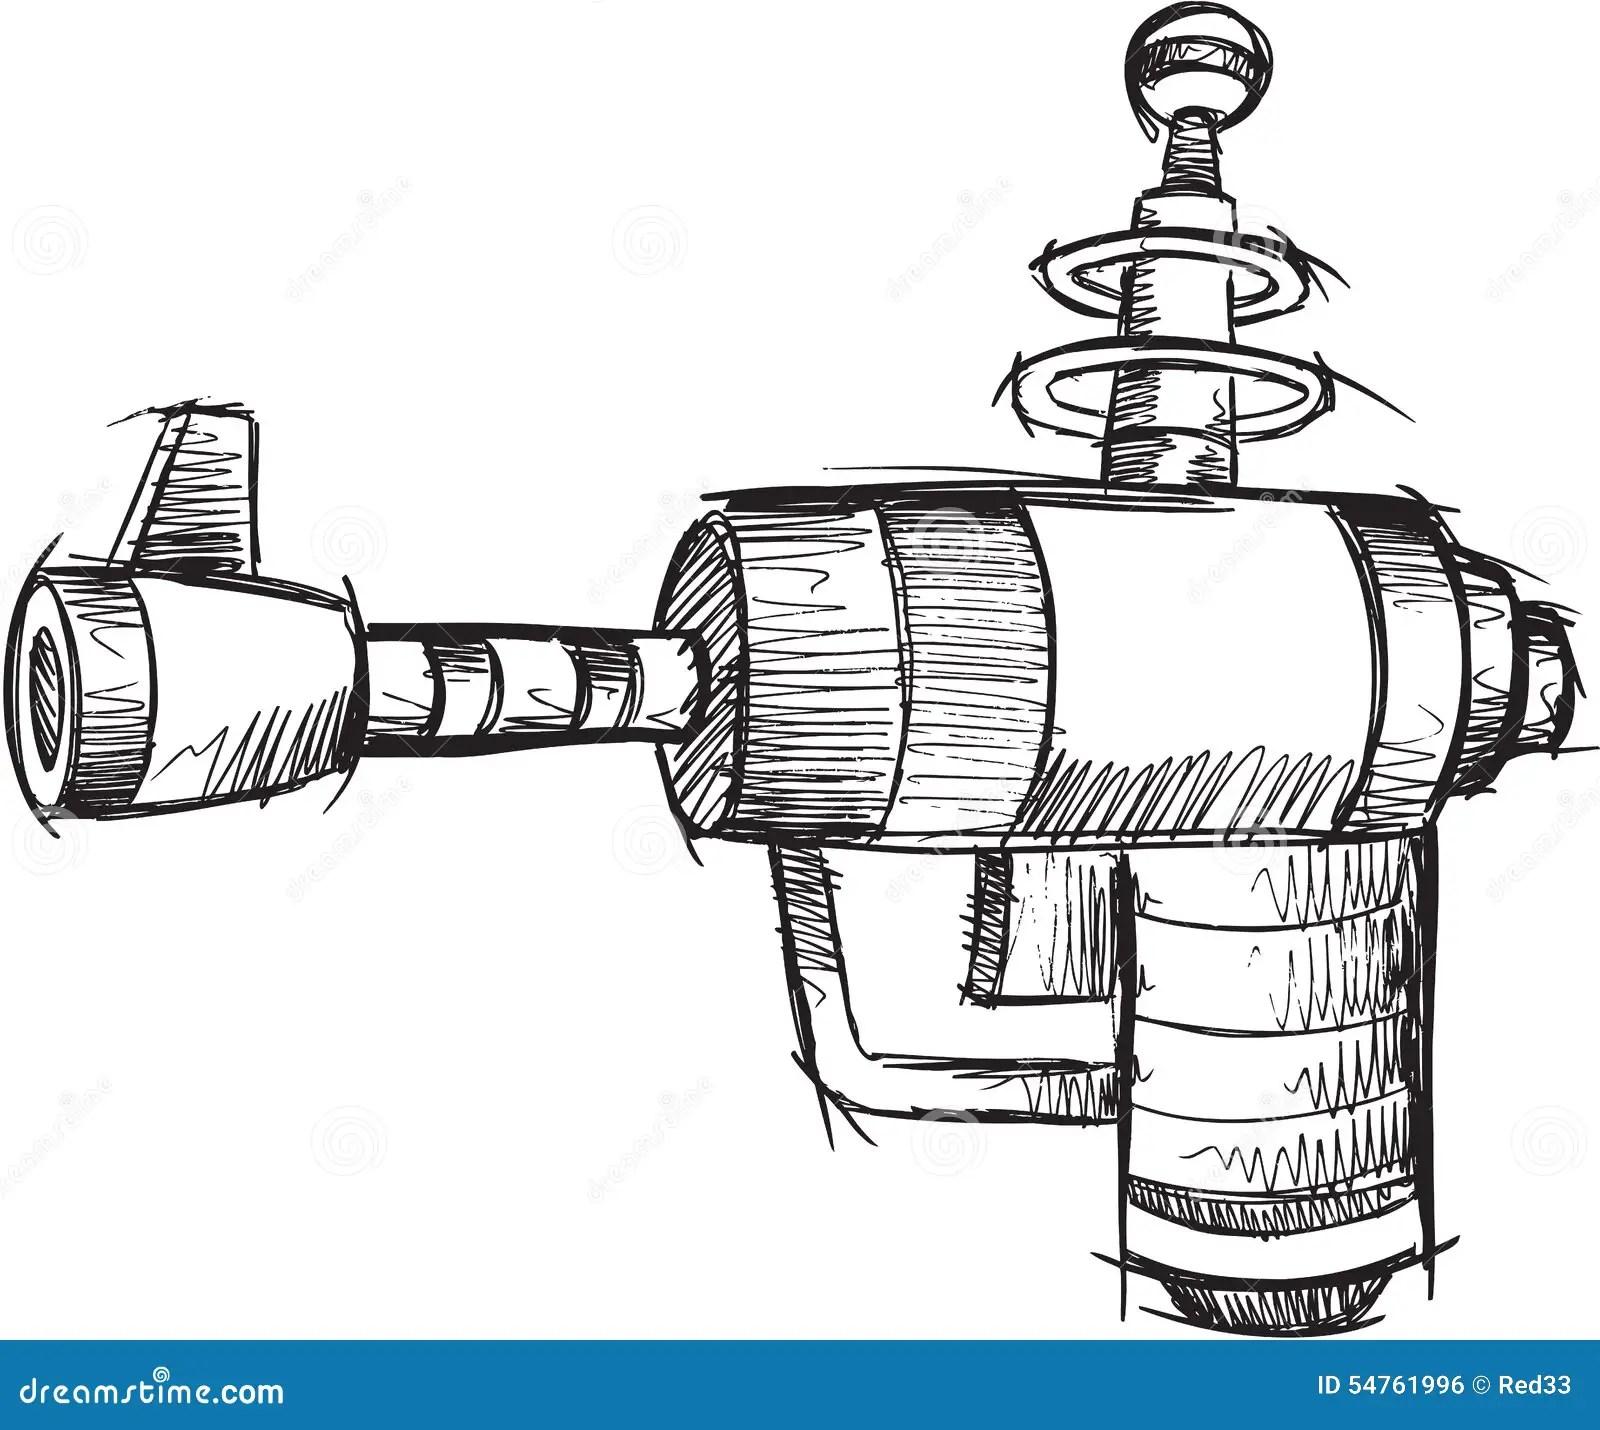 Doodle Gun Vector Stock Vector Illustration Of Technology